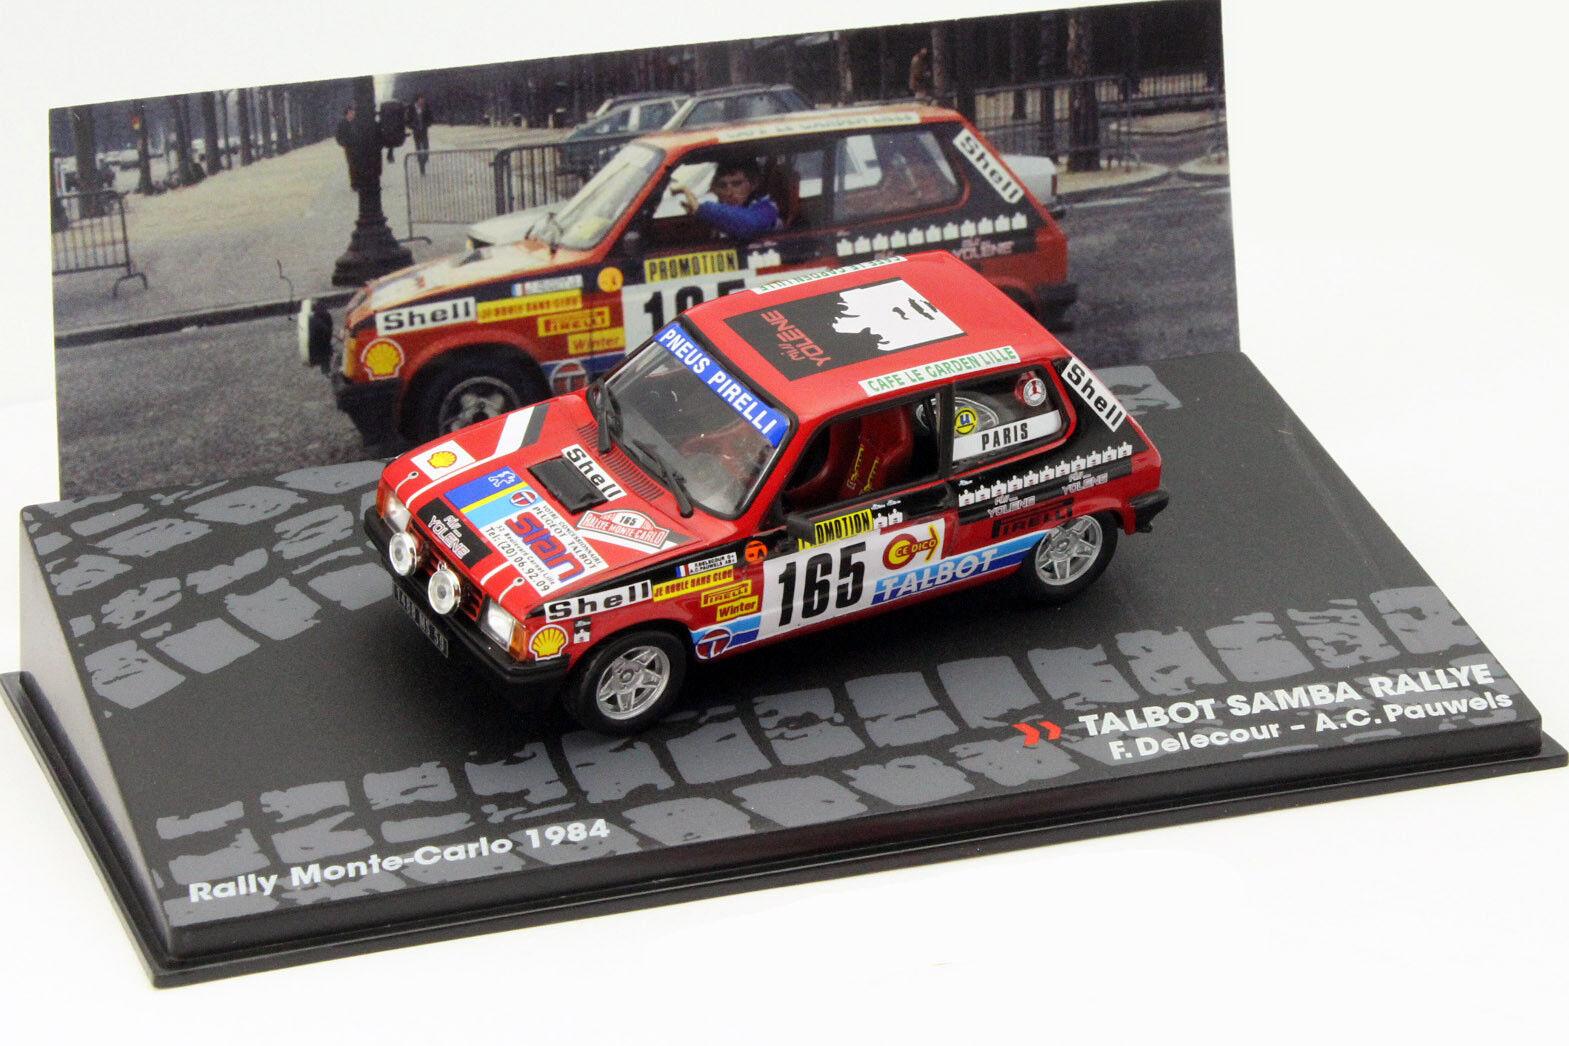 Talbot Samba Rally Rallye Monte Carlo 1984 Delecour, Pauwels 1 43 Altaya